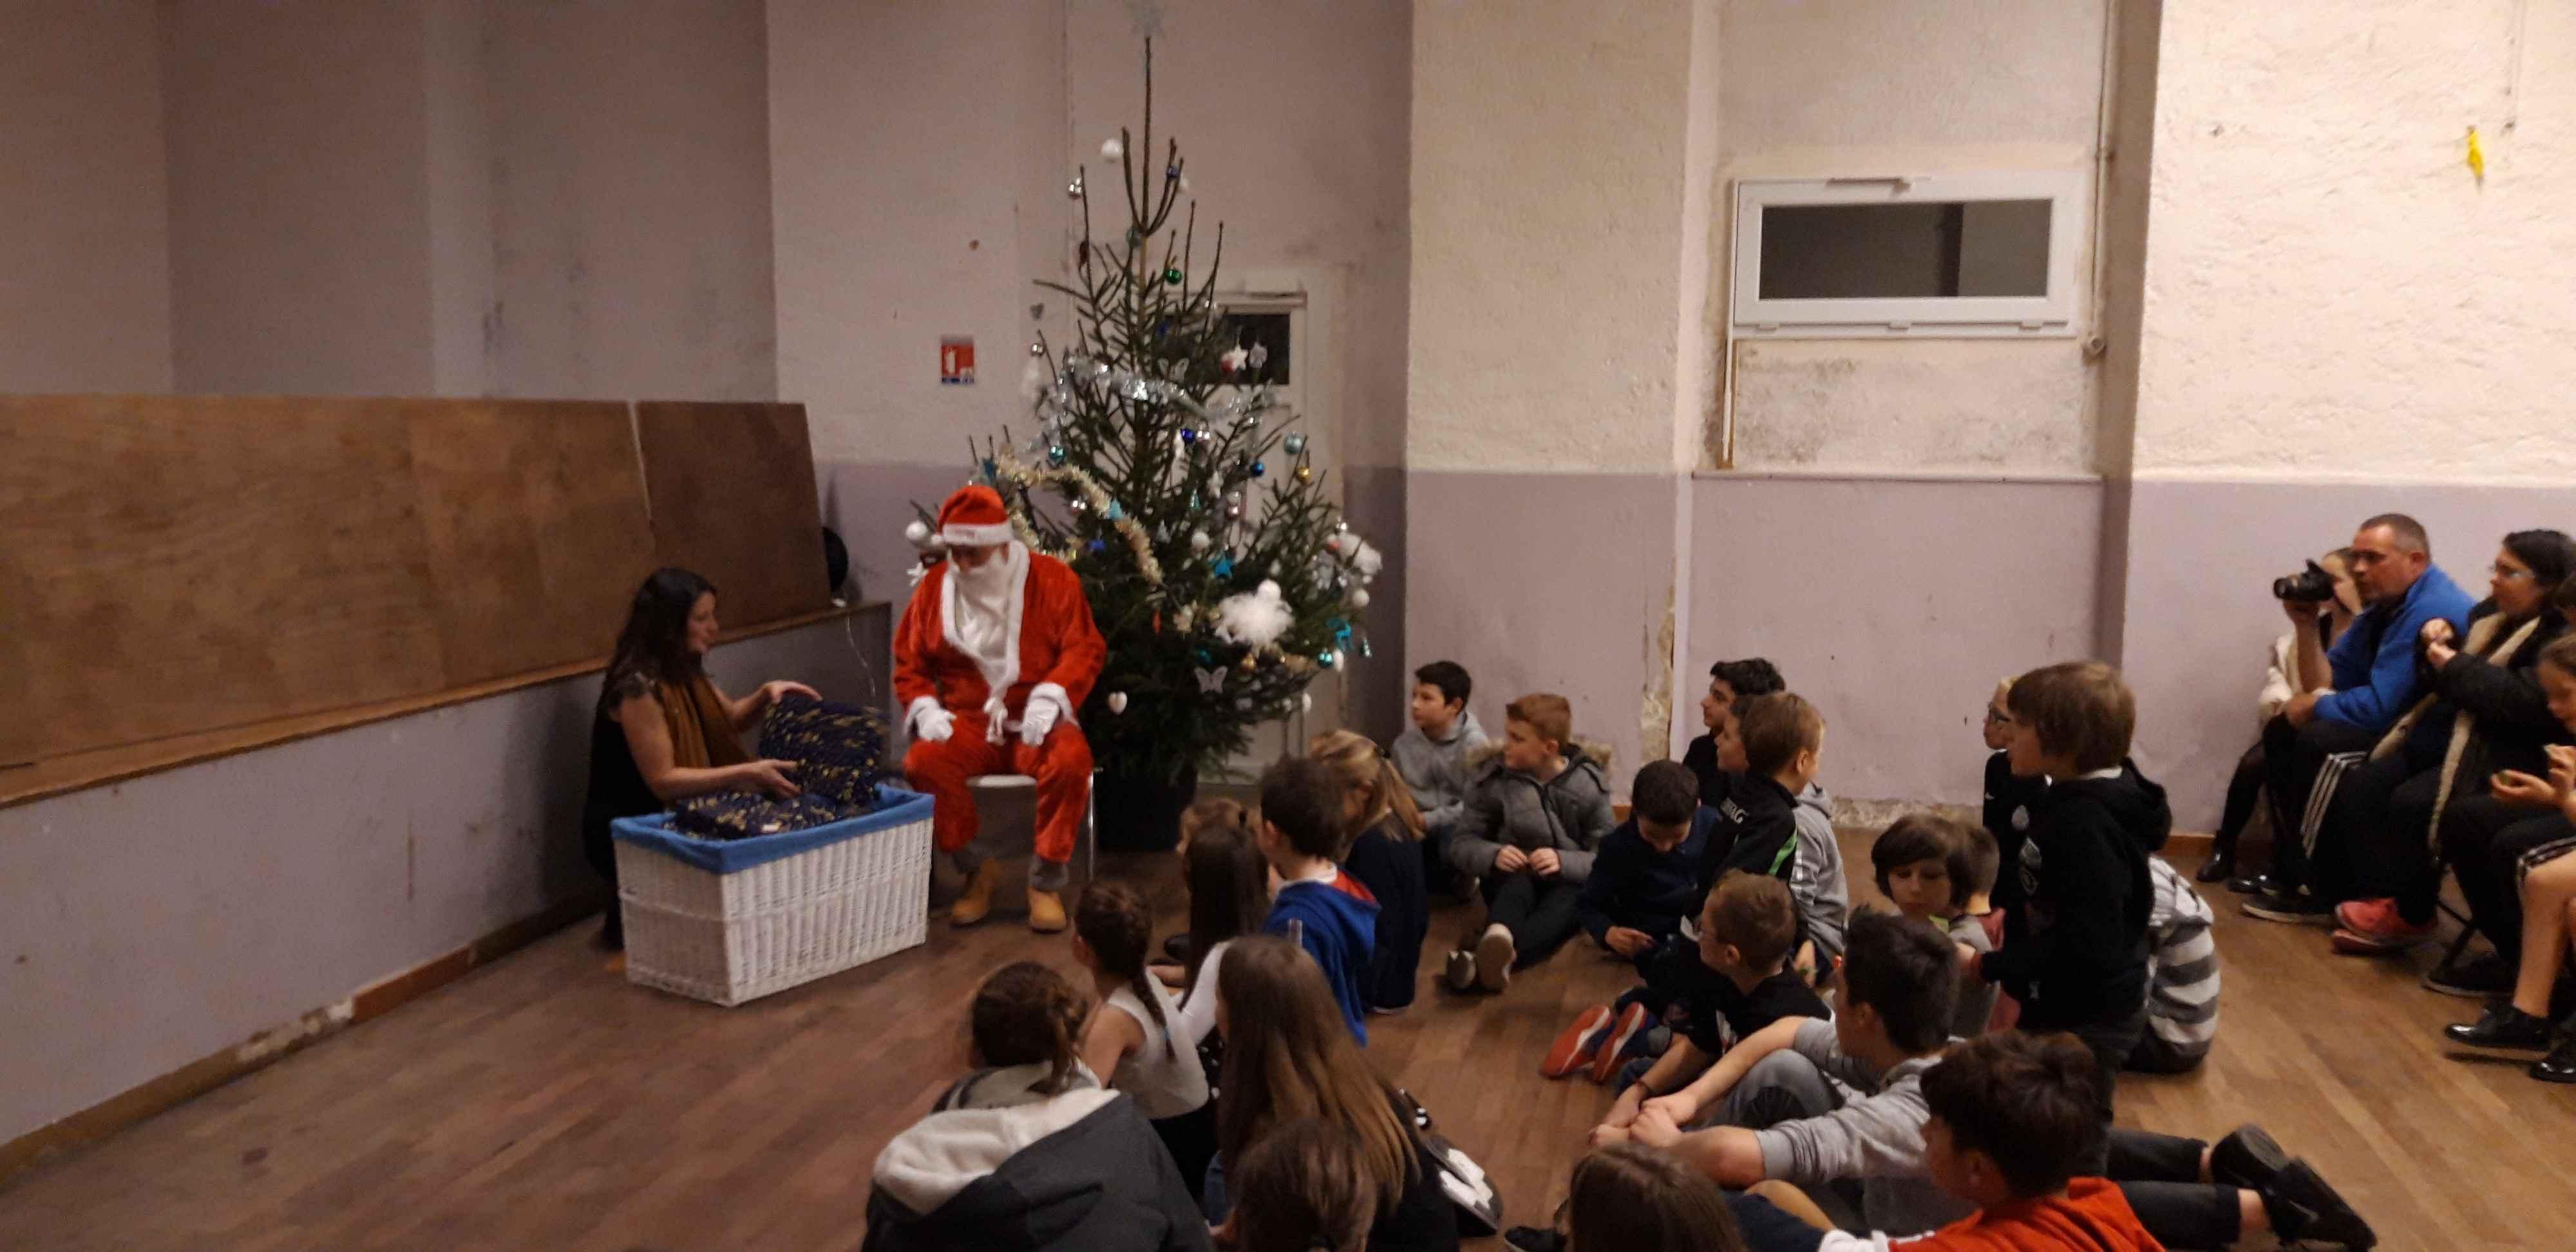 Arbre Noël 2019-12-14 (5)